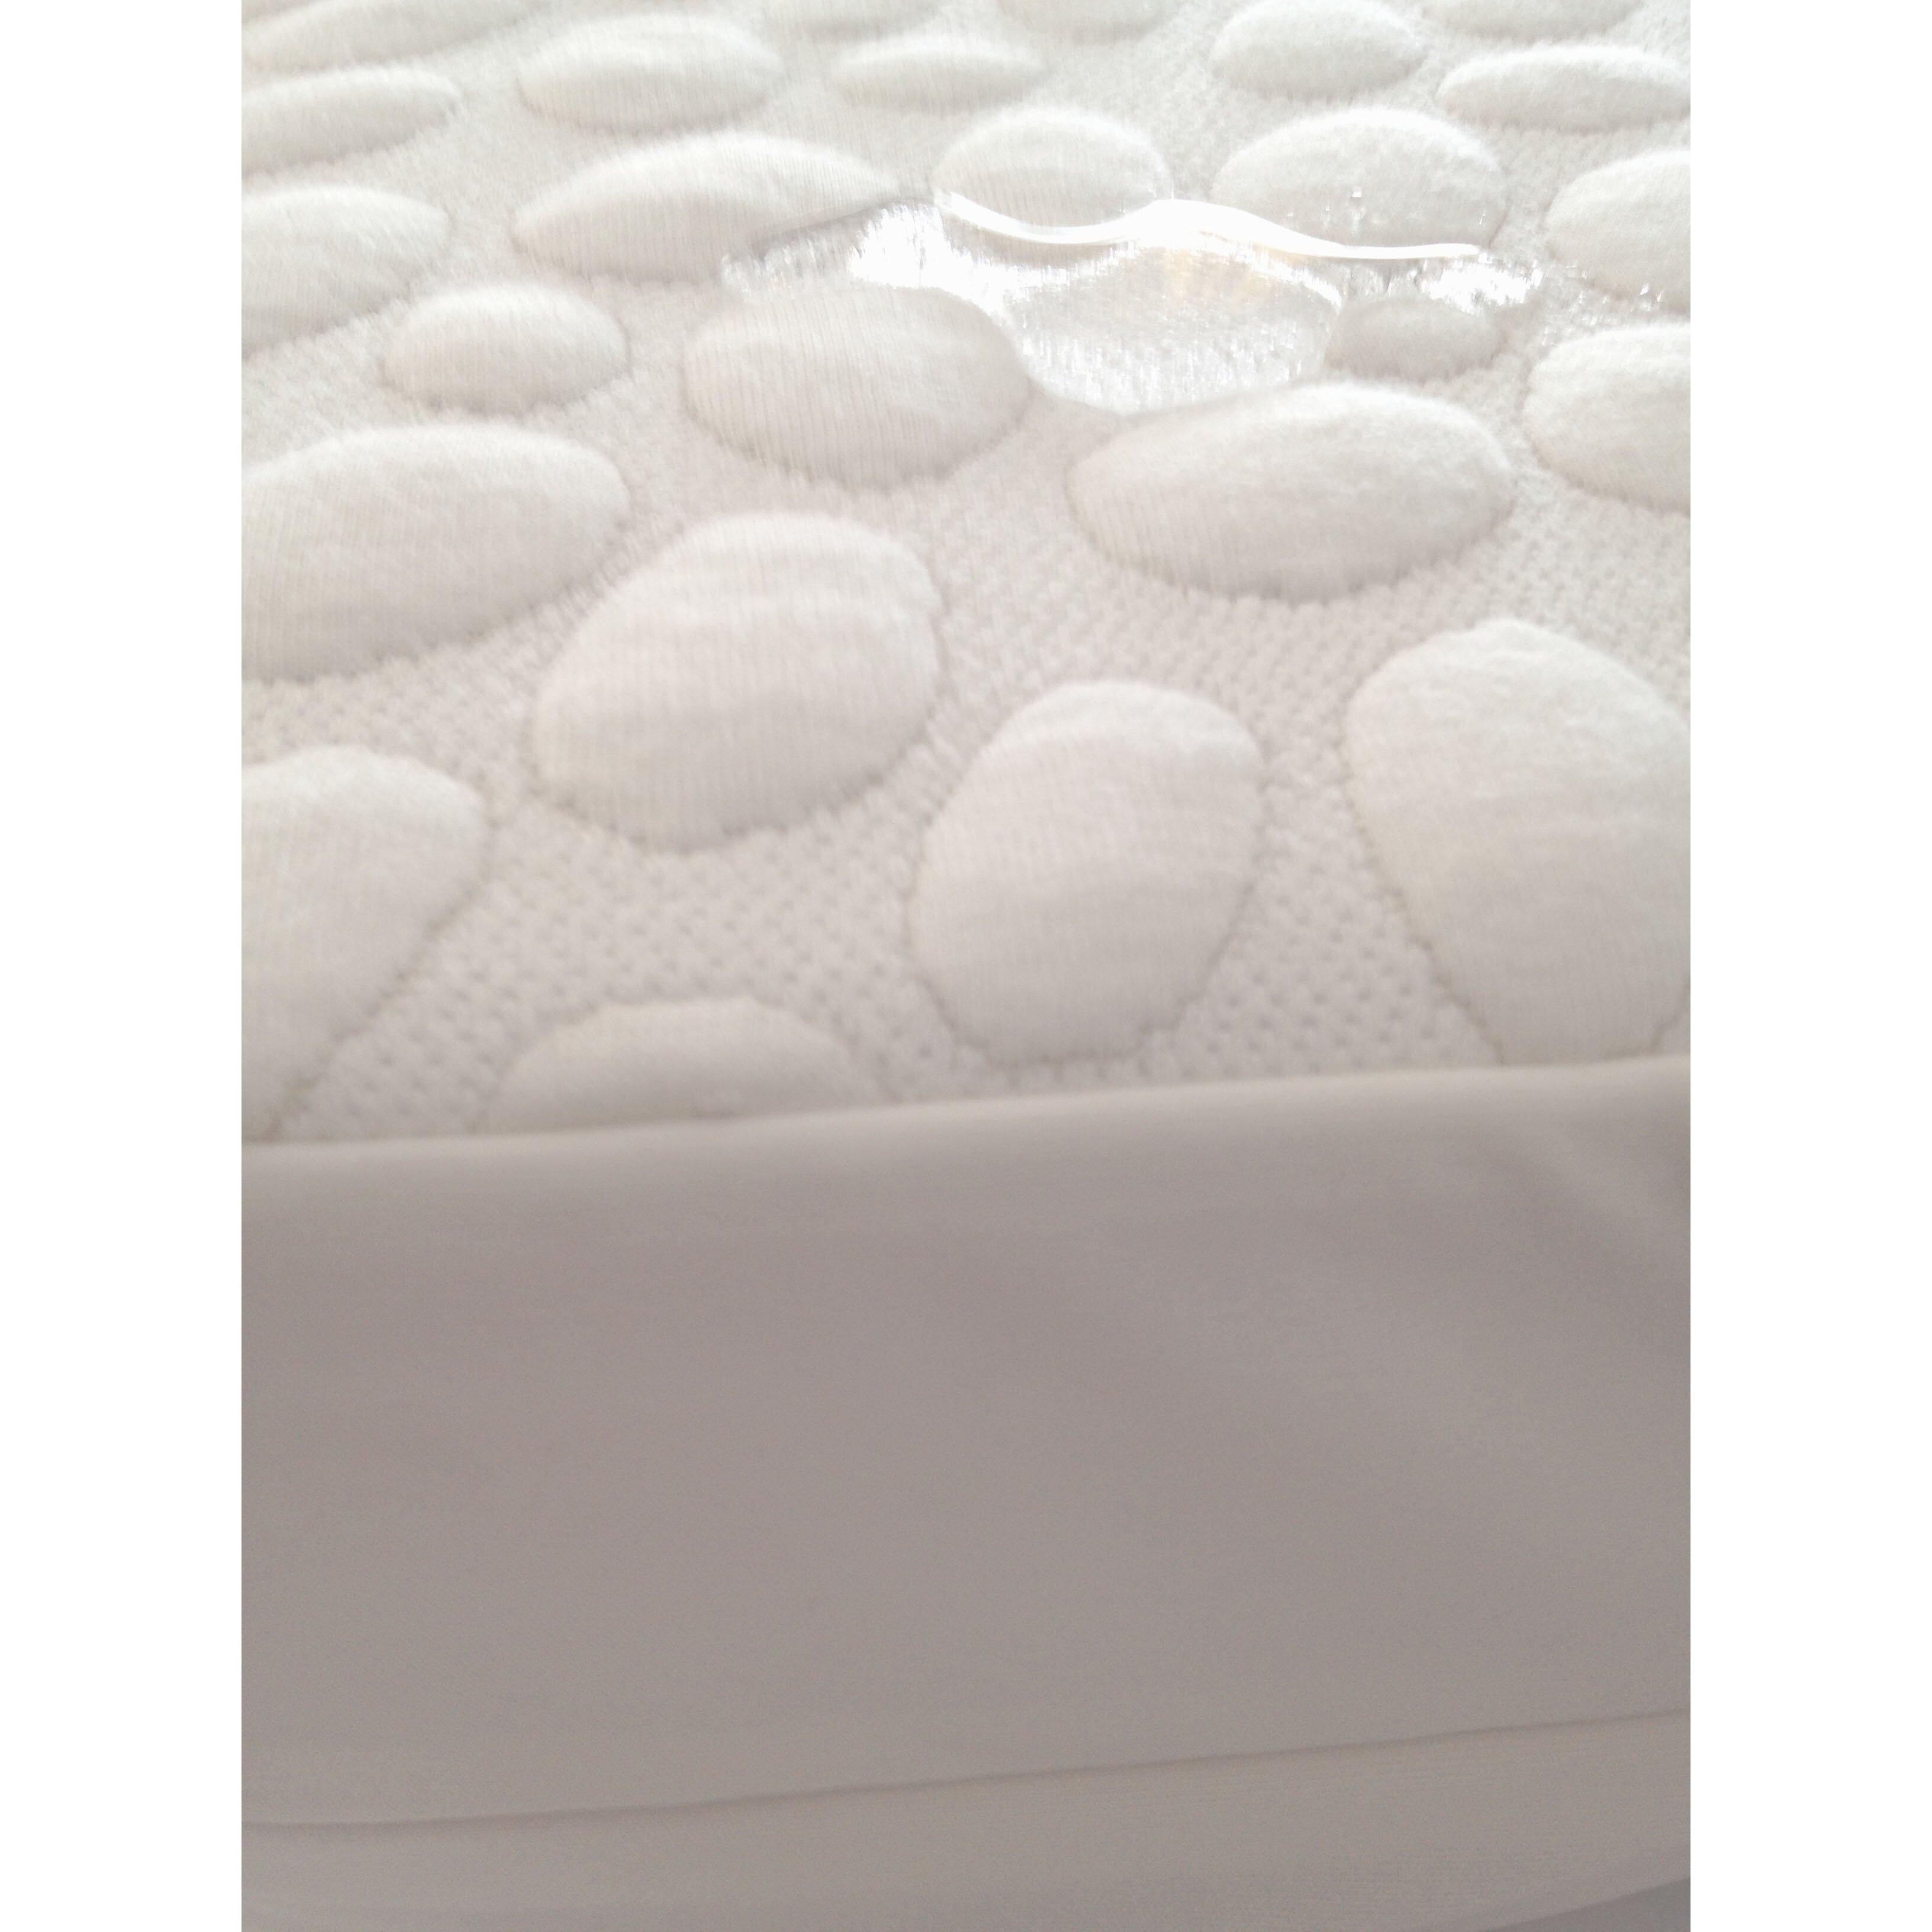 Tencel Mattress Review Dream Decor Pebbletex Tencel Crib Bed Bug Encasement | Wayfair